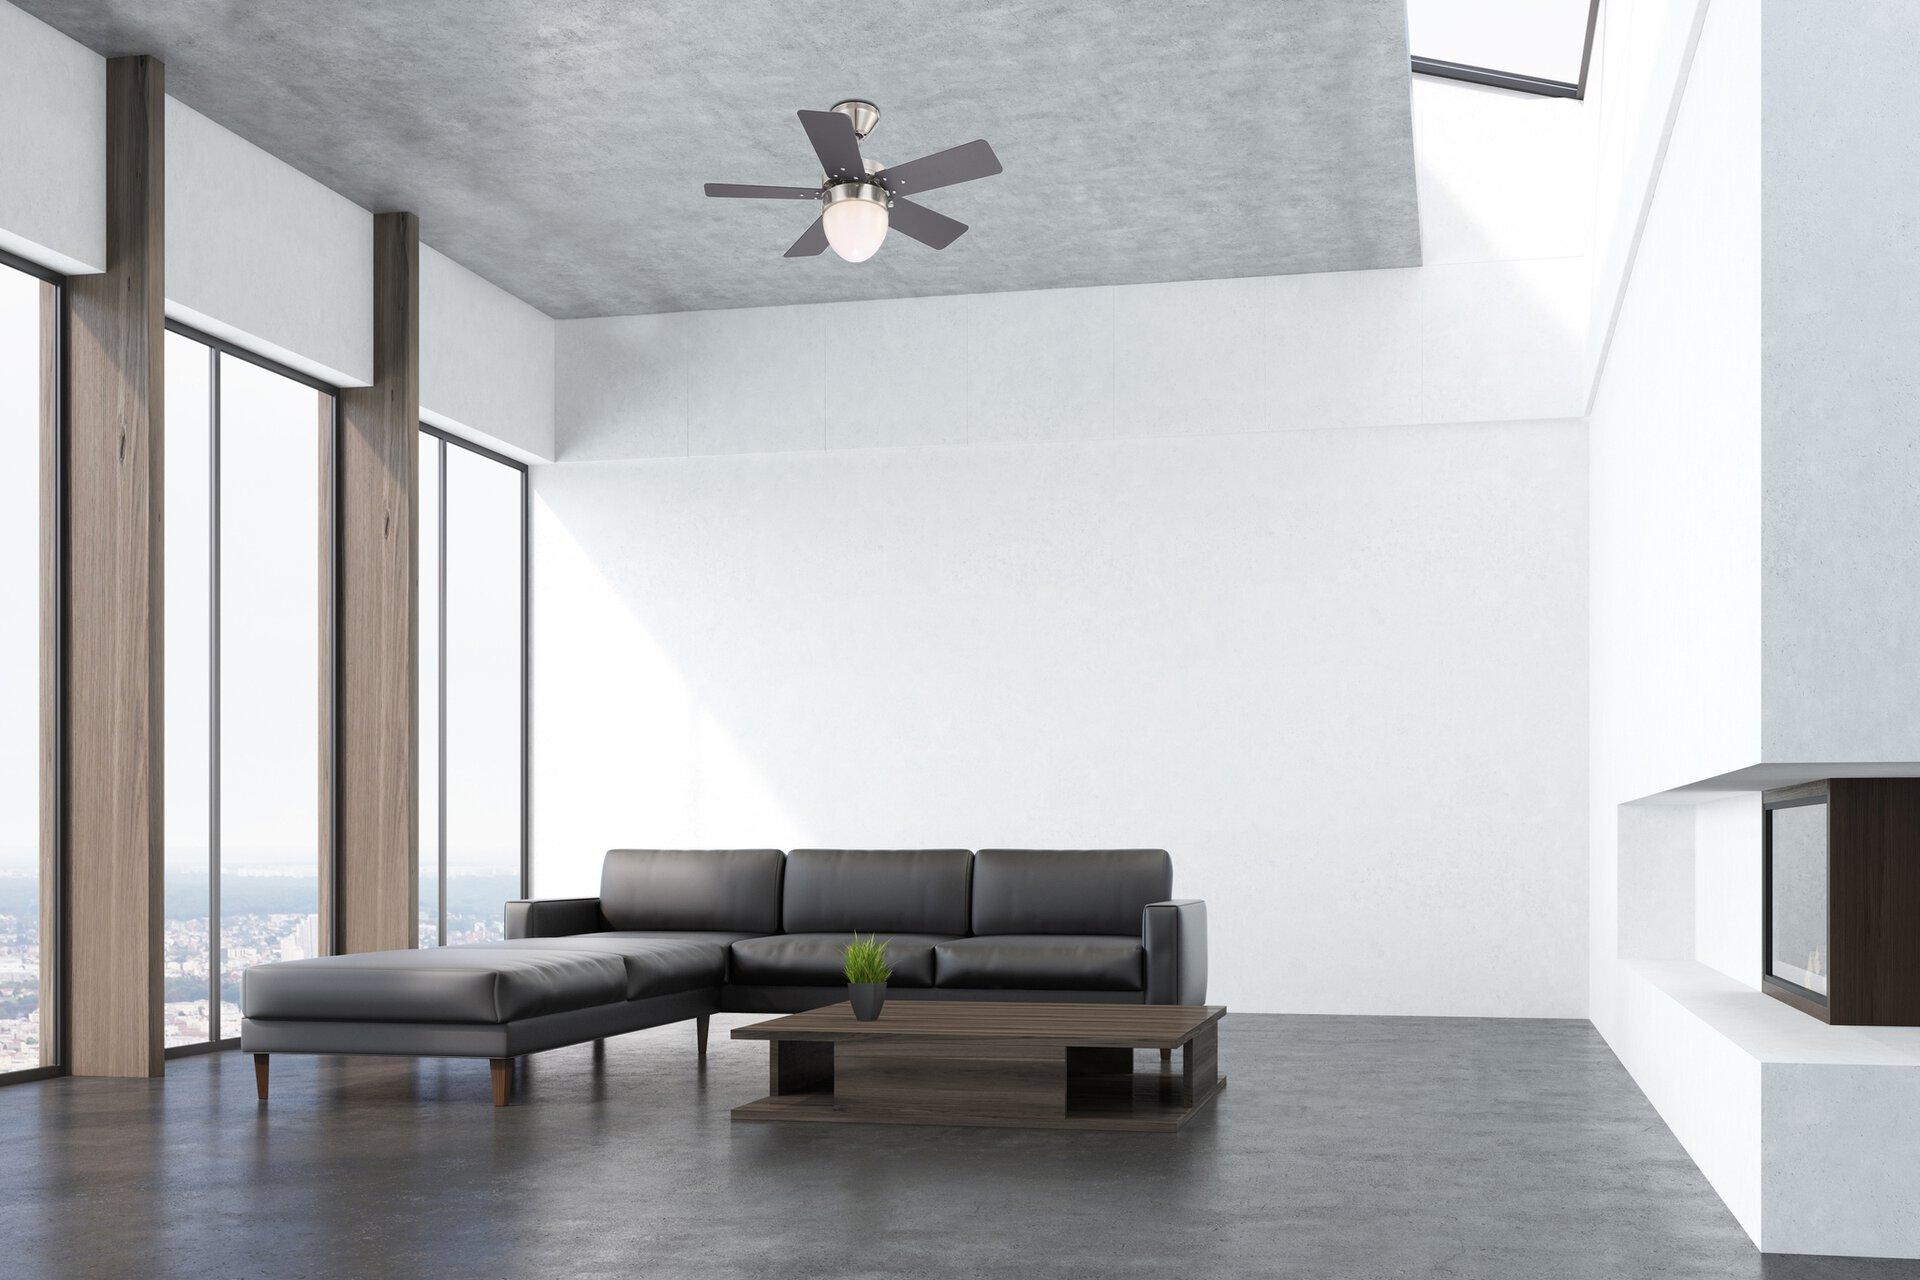 Deckenventilator MARVA Globo Metall silber 76 x 41 x 76 cm